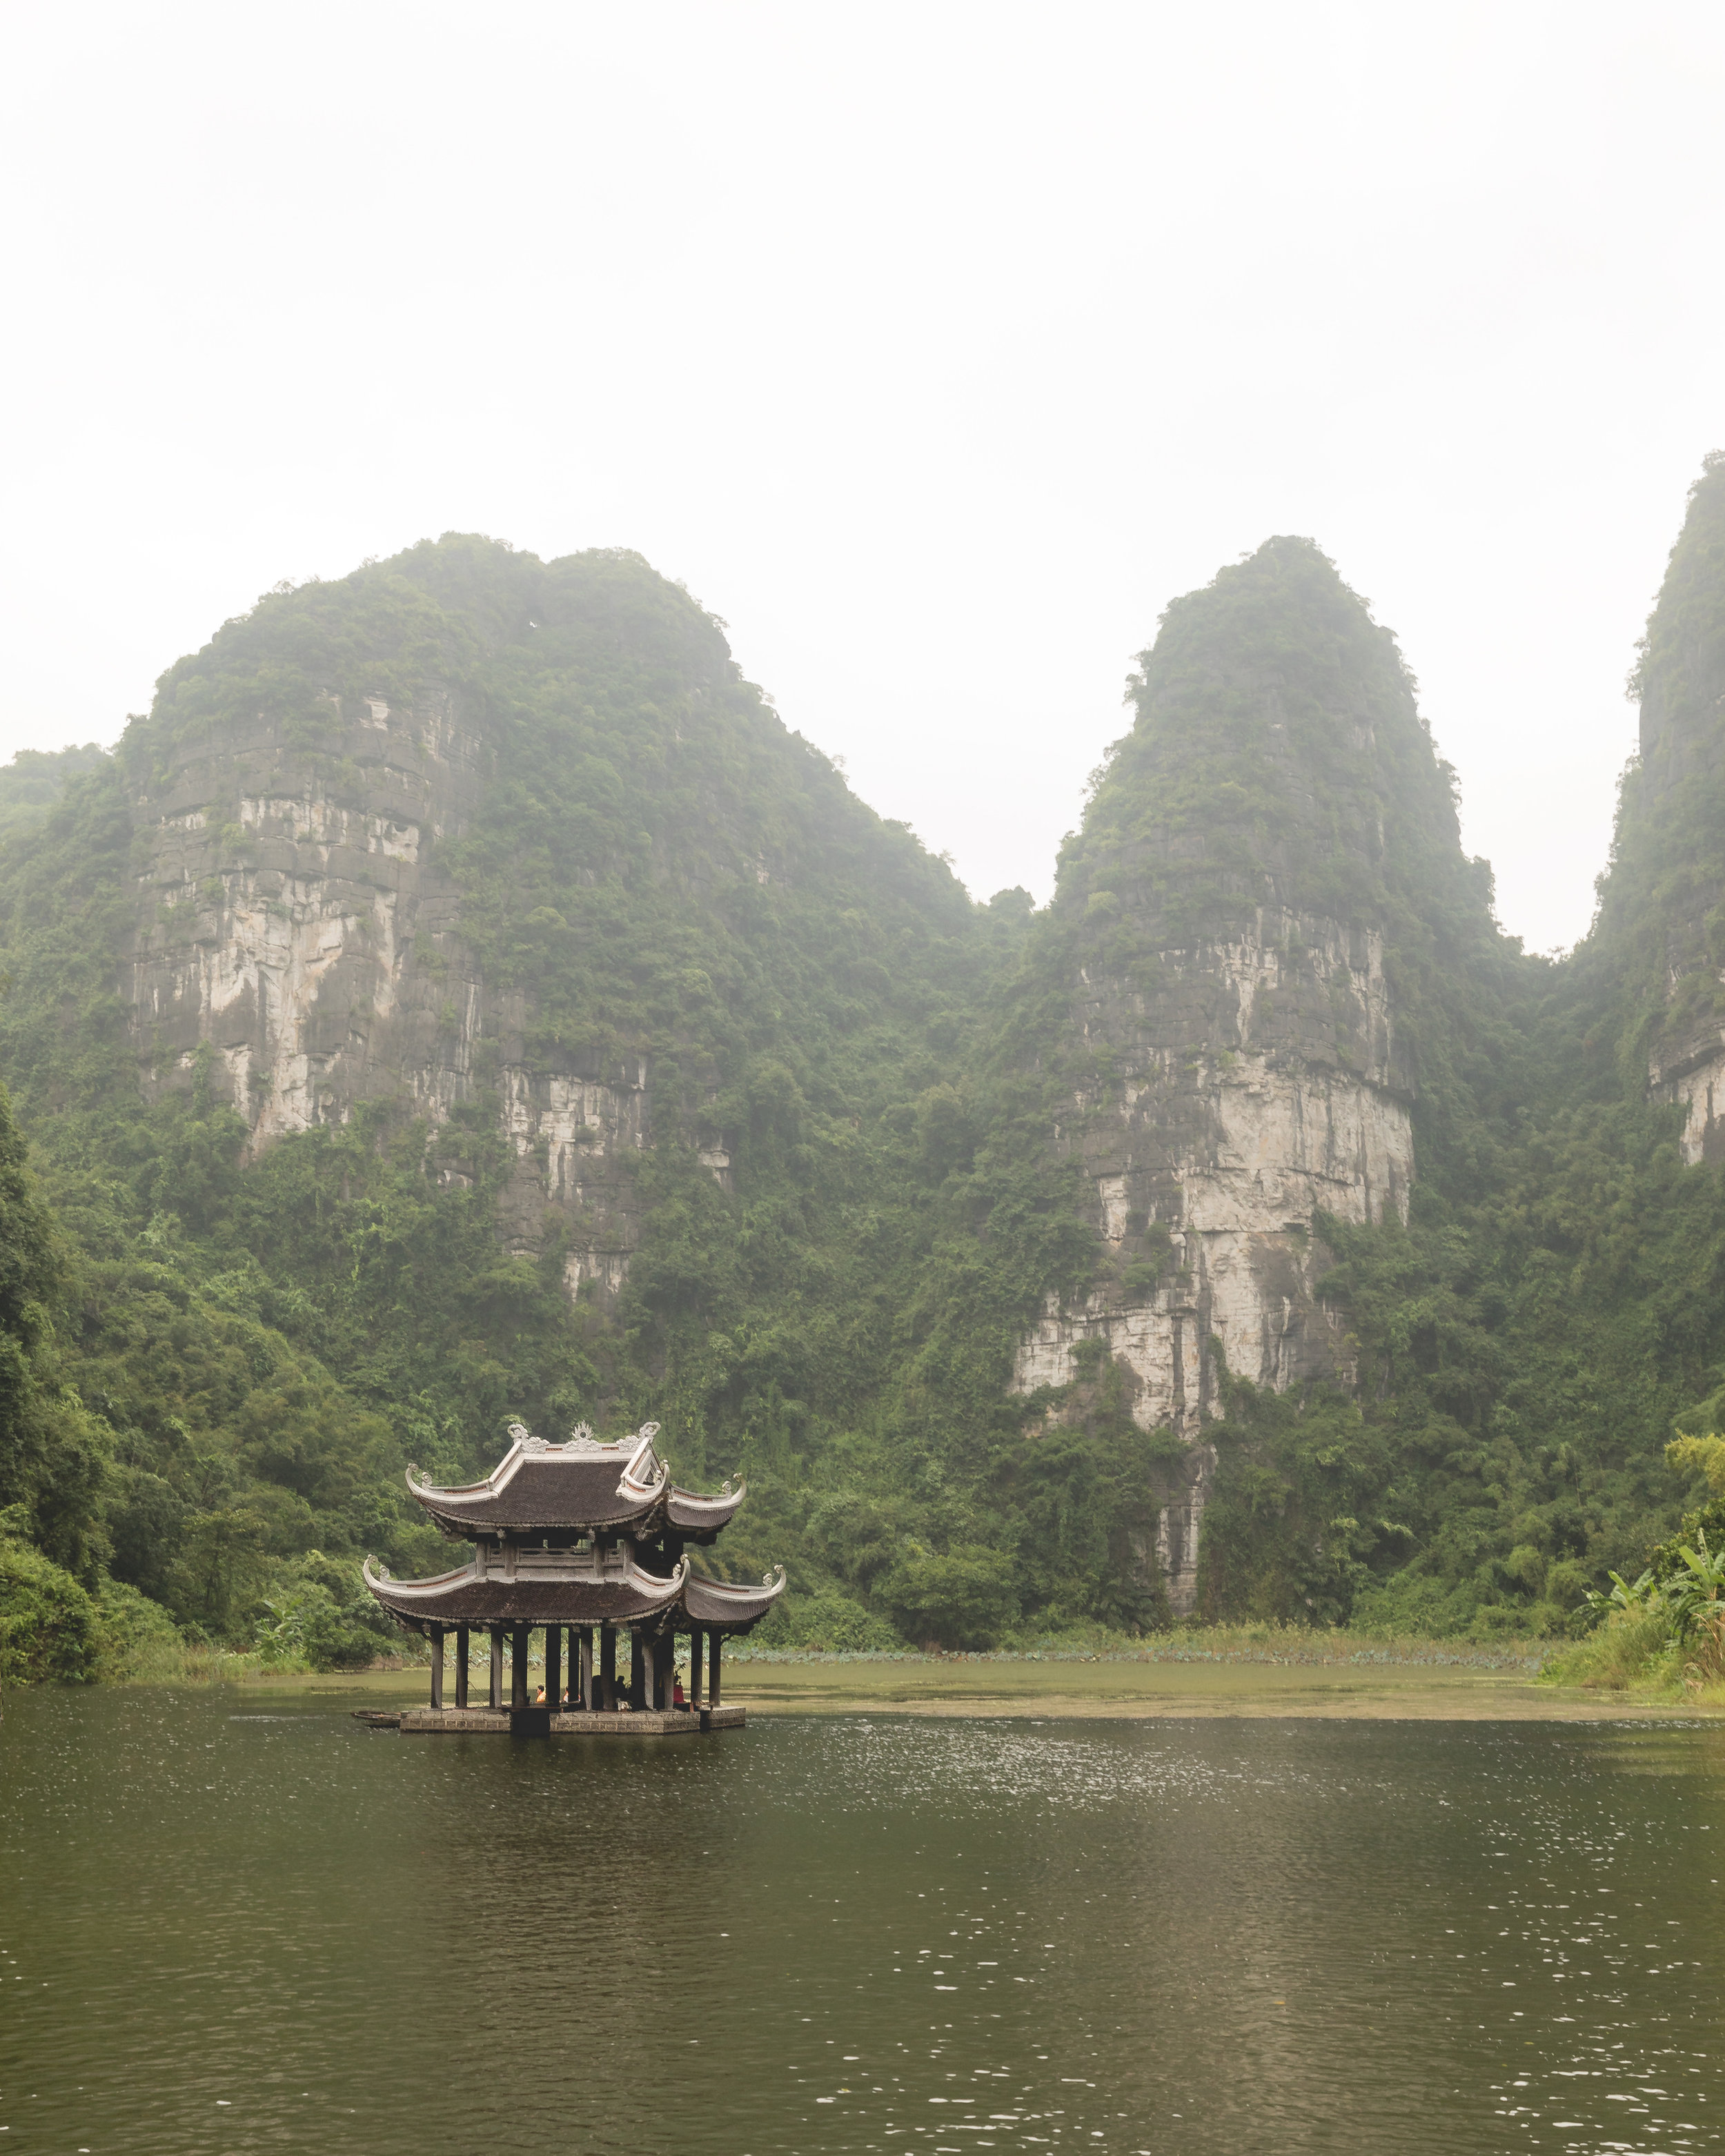 A pagoda in the beautiful Trang An